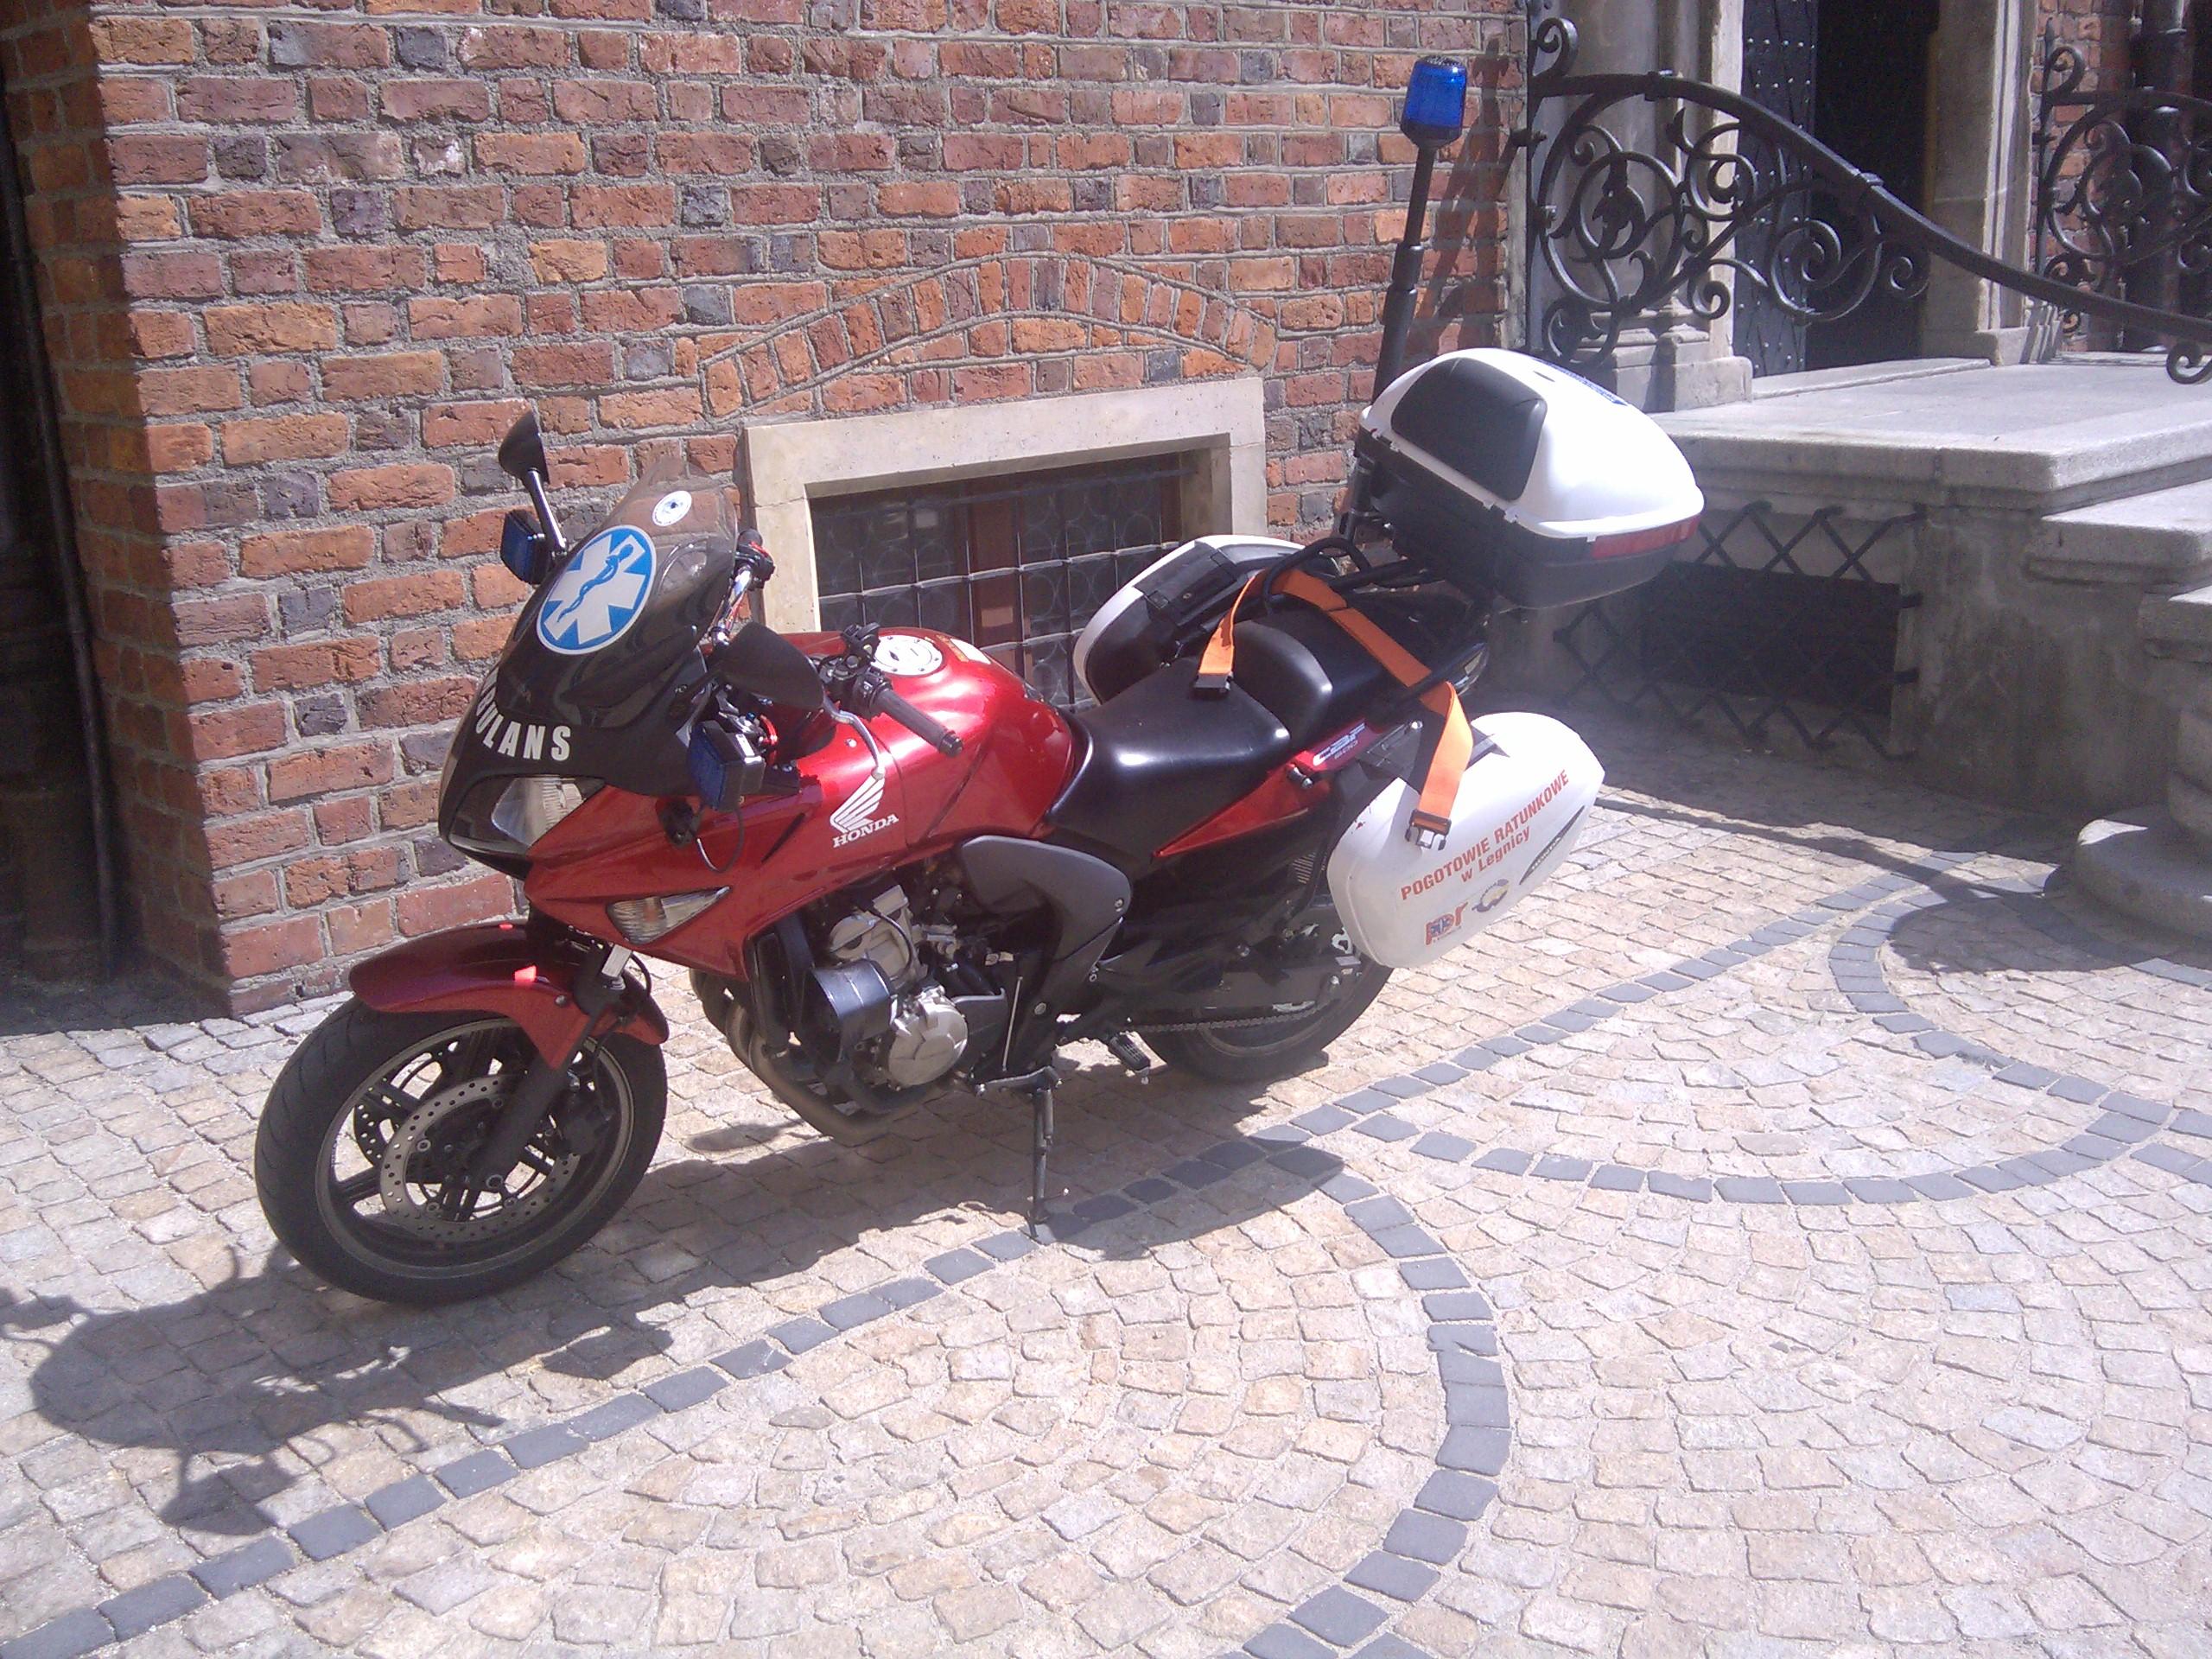 File:Honda CBF 600 Rettungsdienst.jpg - Wikimedia Commons